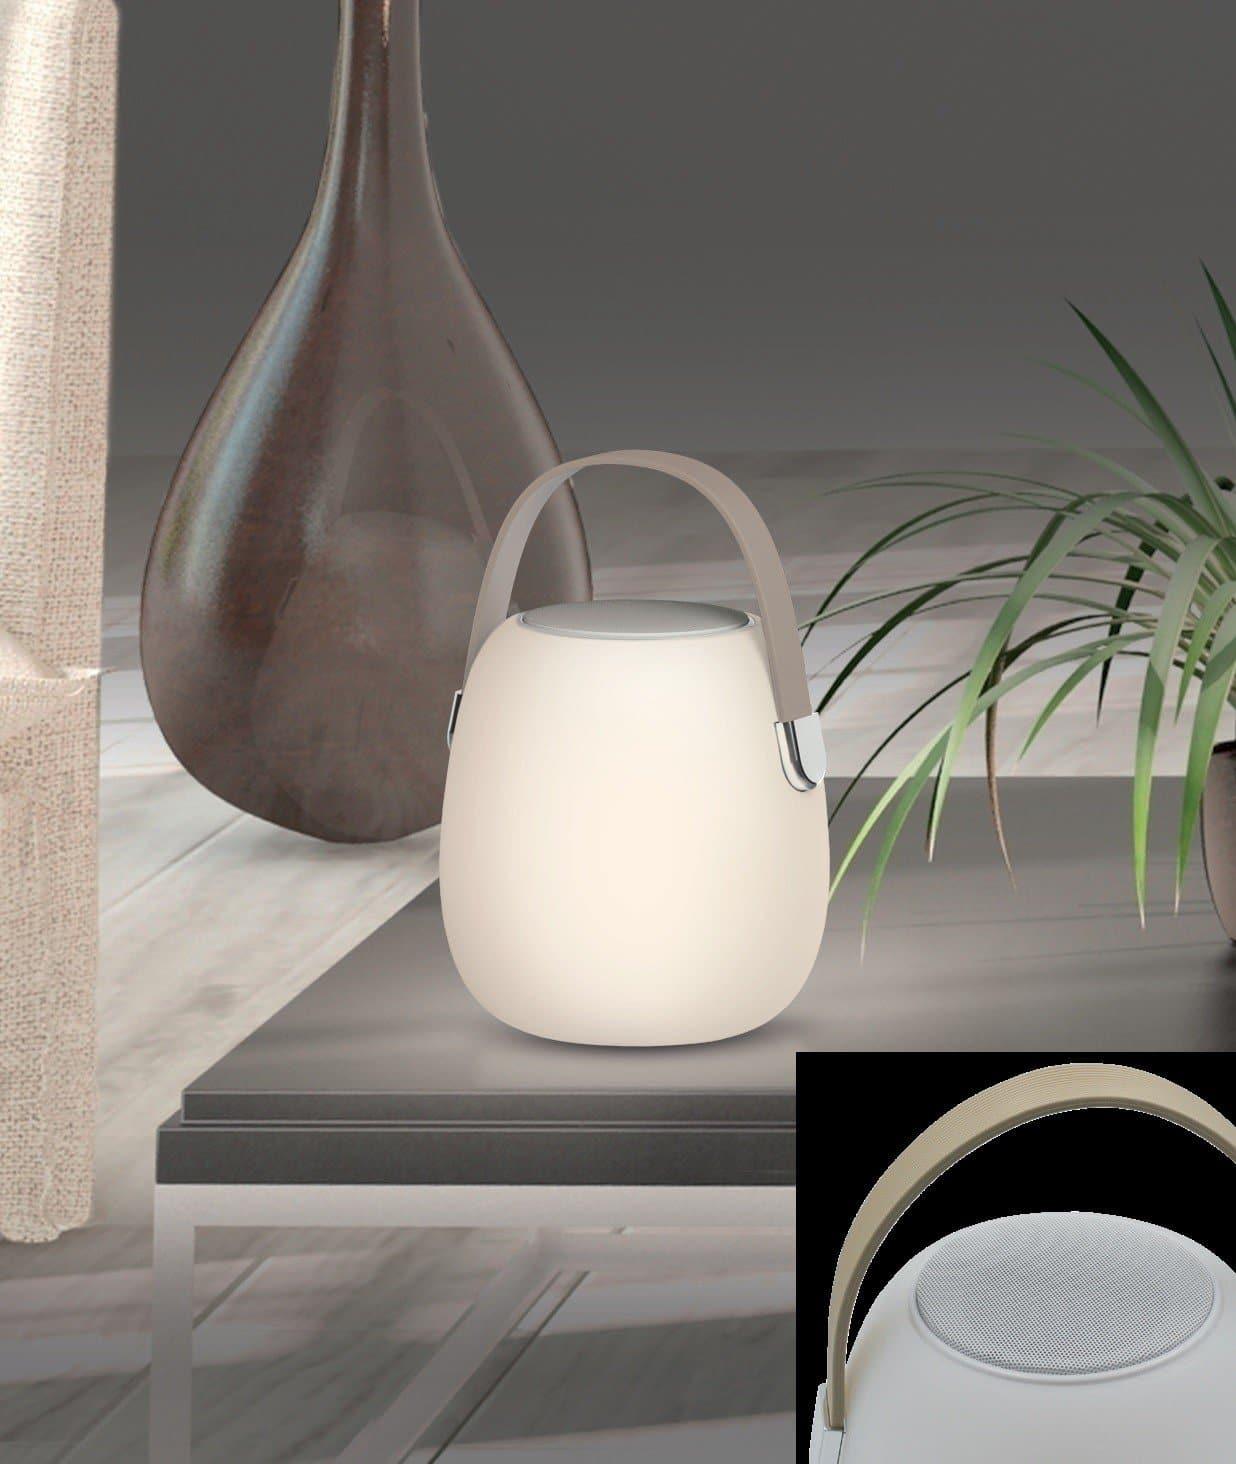 acb-take-me-lampara-sobremesa-portatil-blanco-iluminacion-coben-2